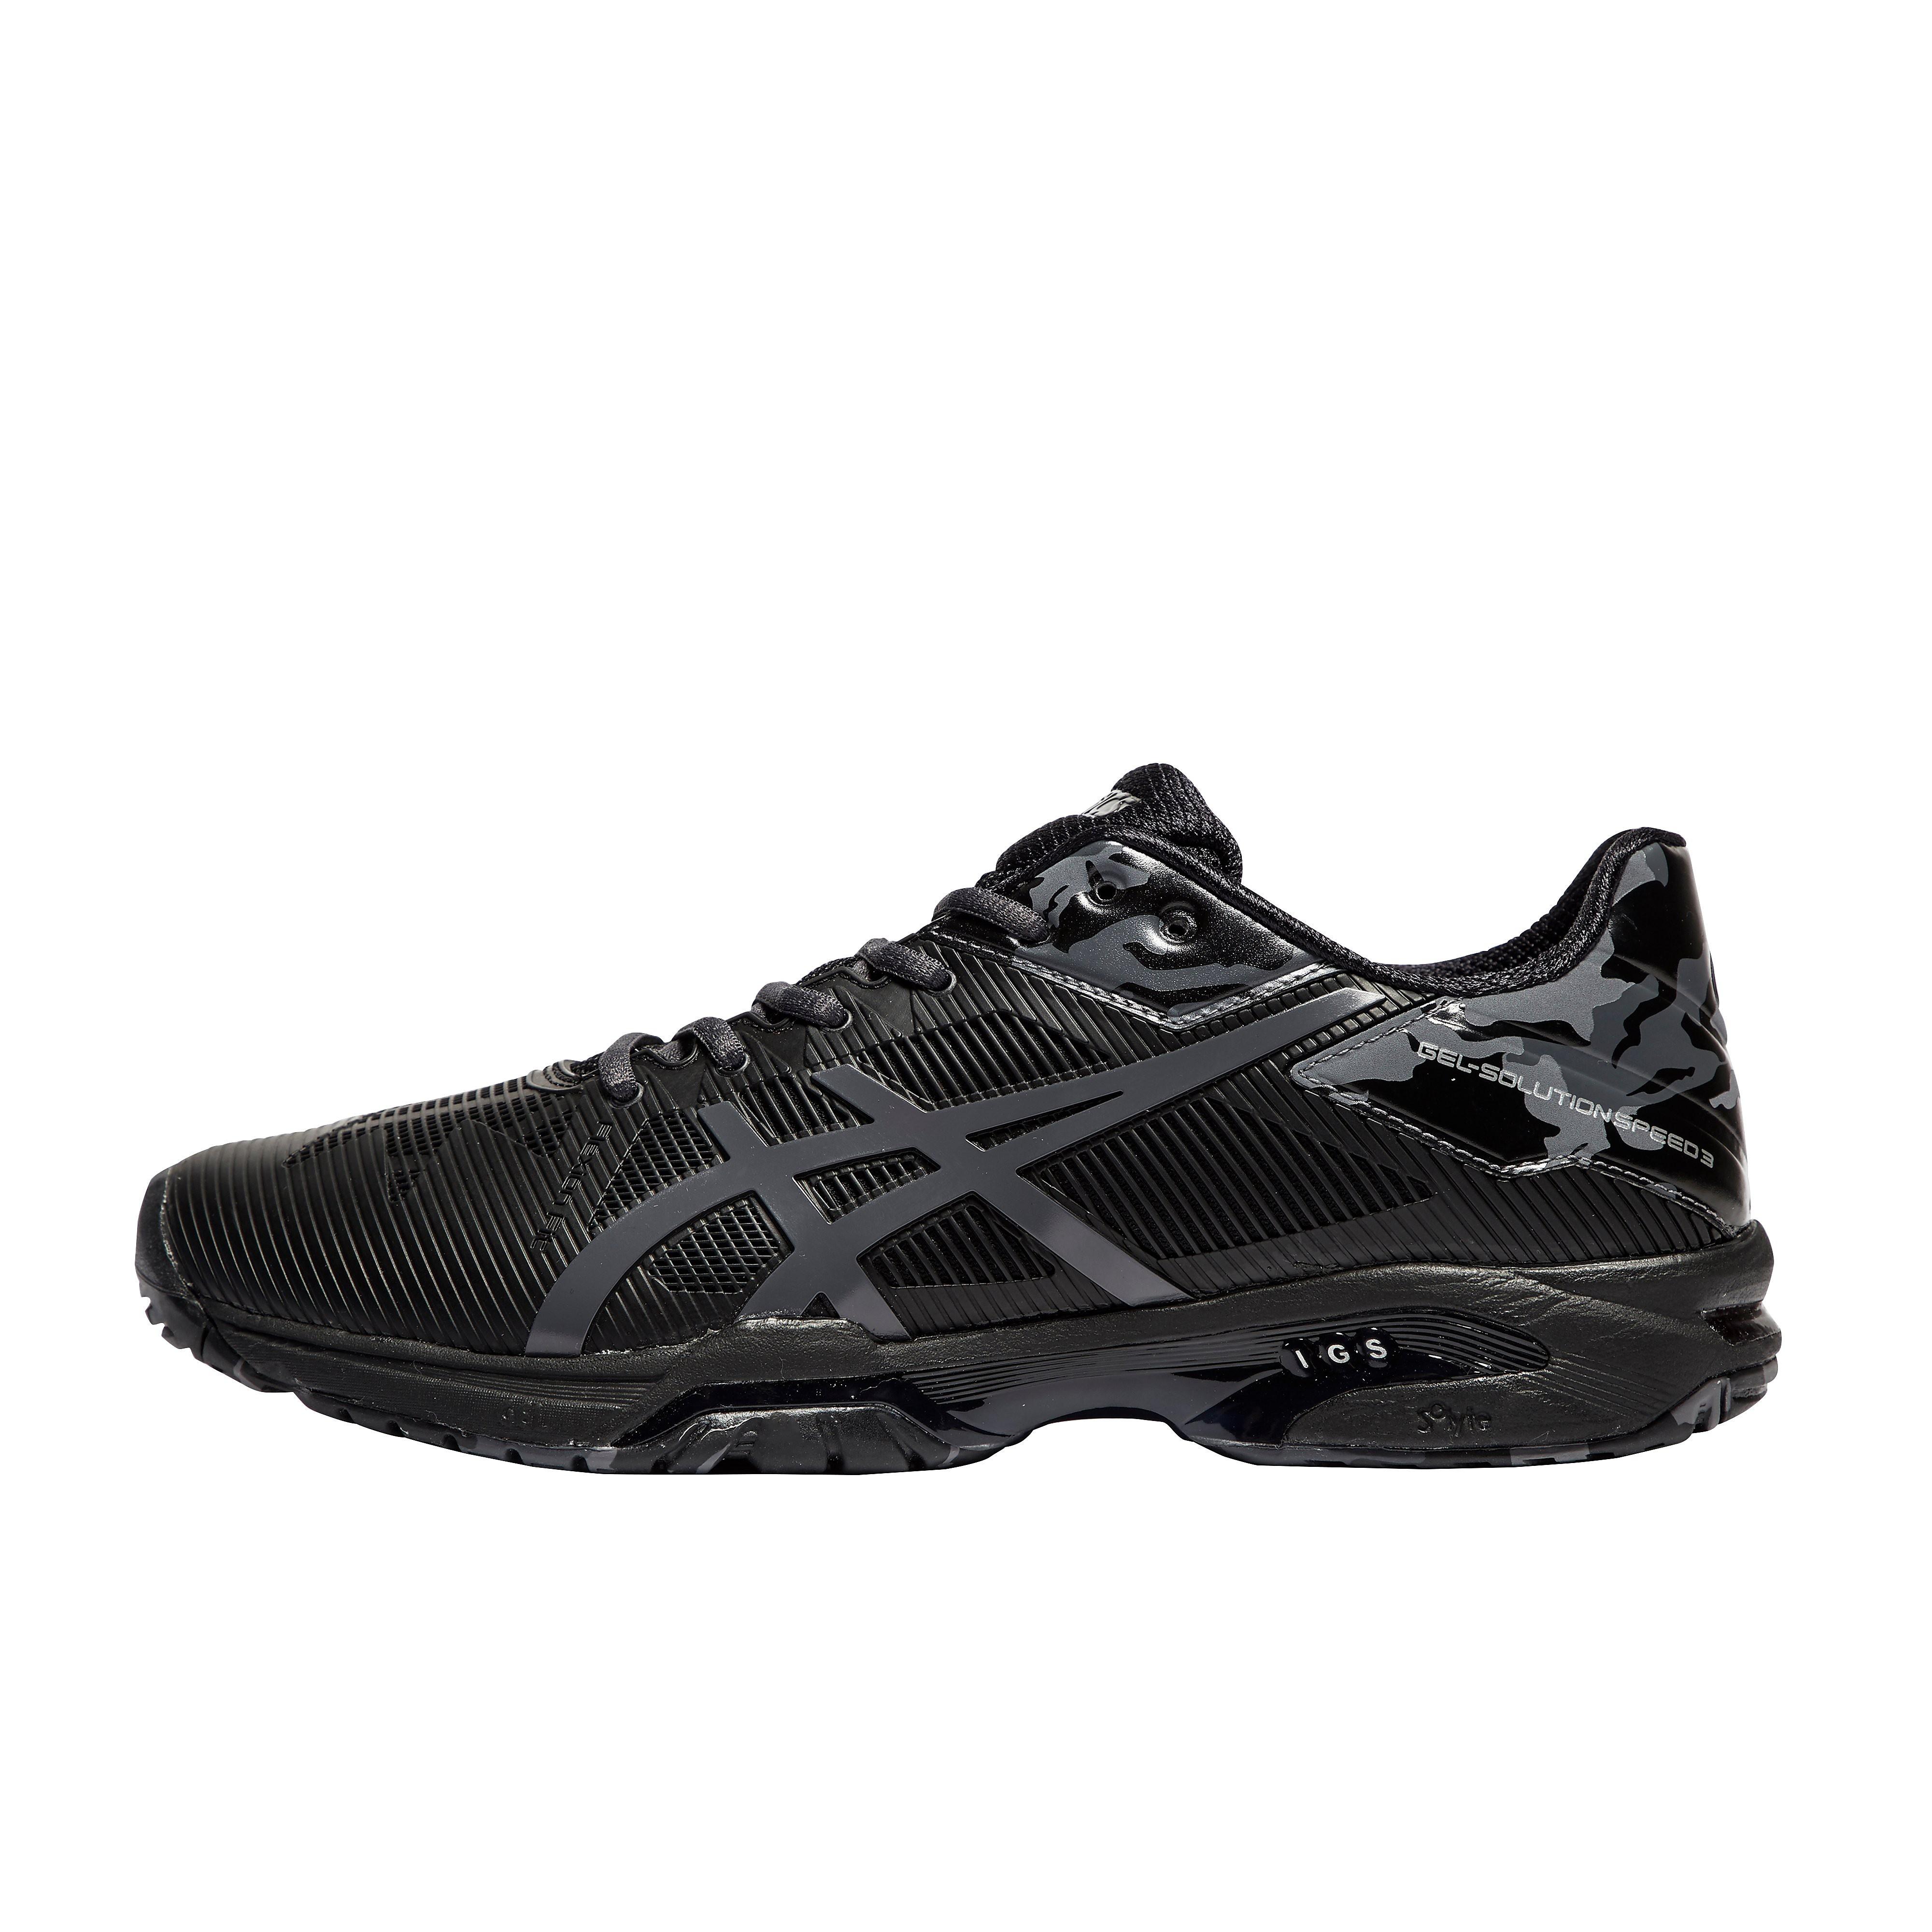 ASICS Gel-Solution Speed 3 L.E. Clay Men's Tennis Shoes